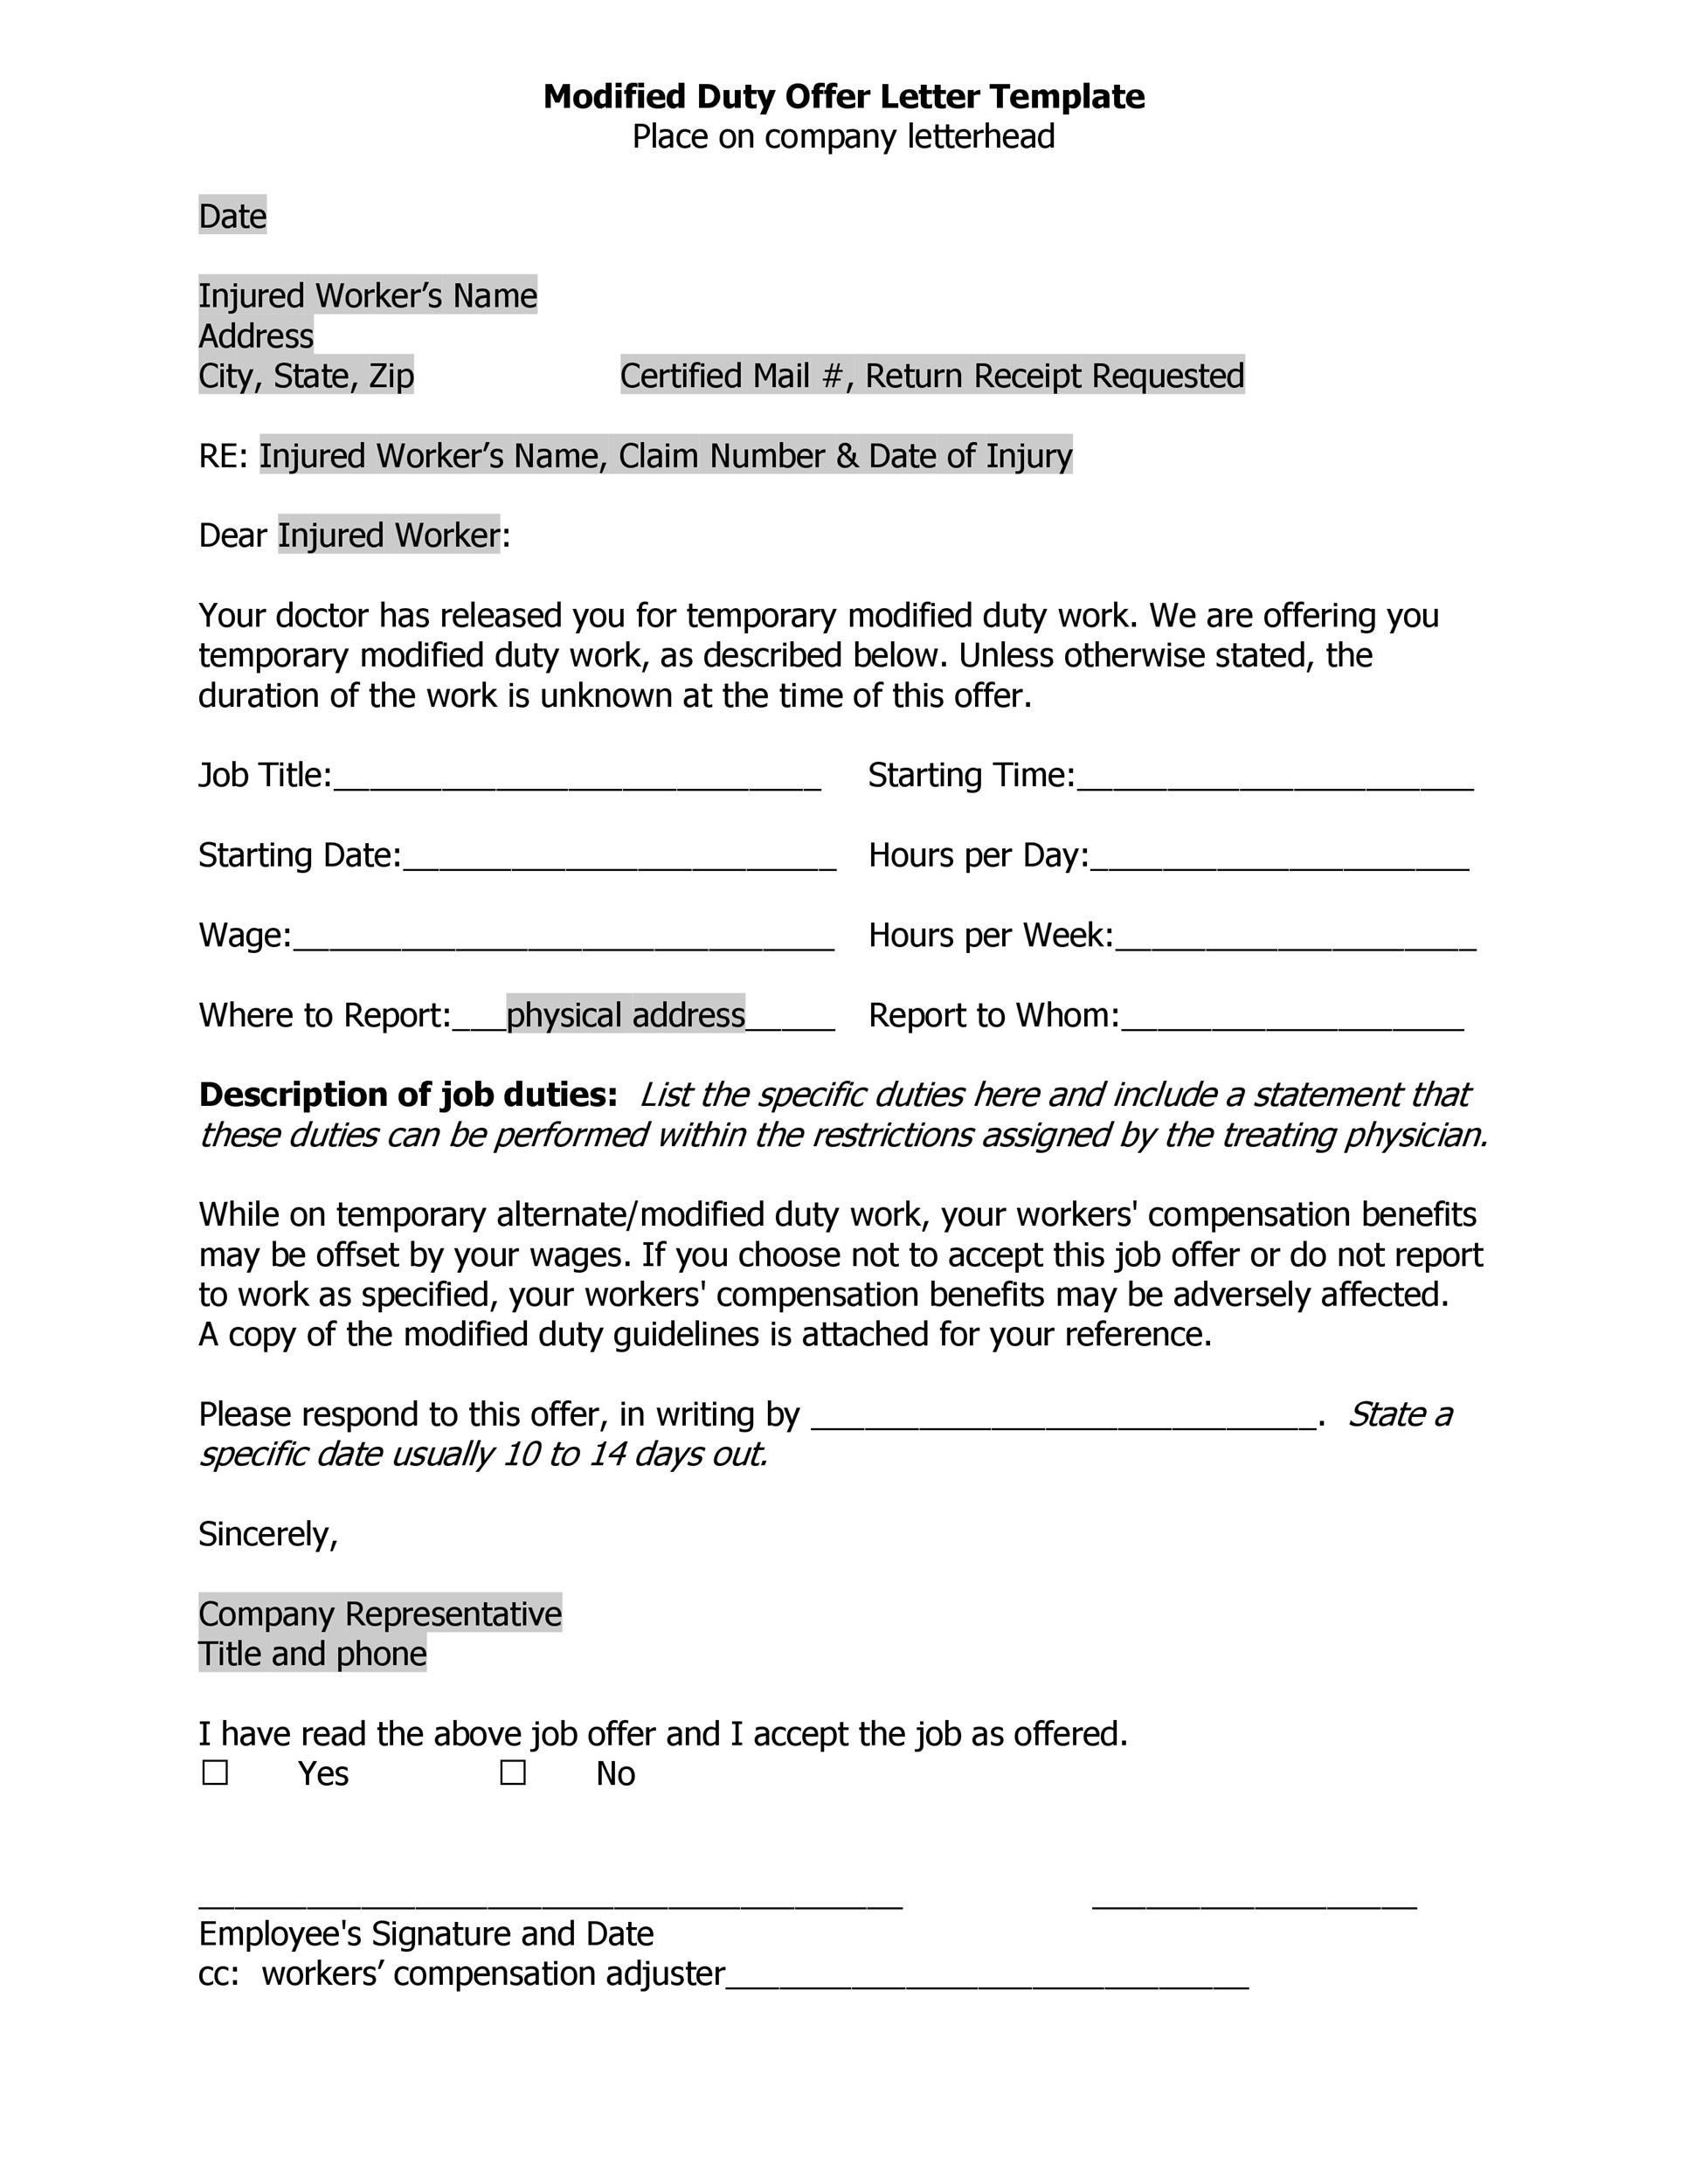 Free Offer letter 31